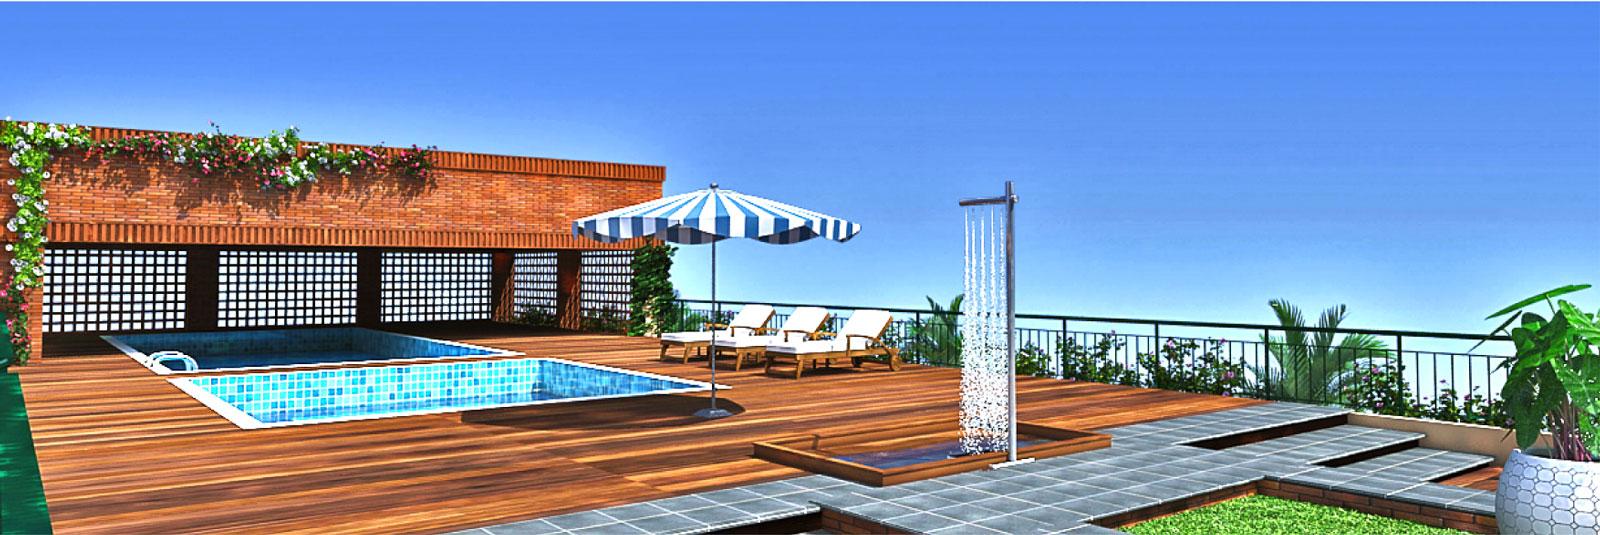 amenities-features-Picture-griha-unnathi-3023468